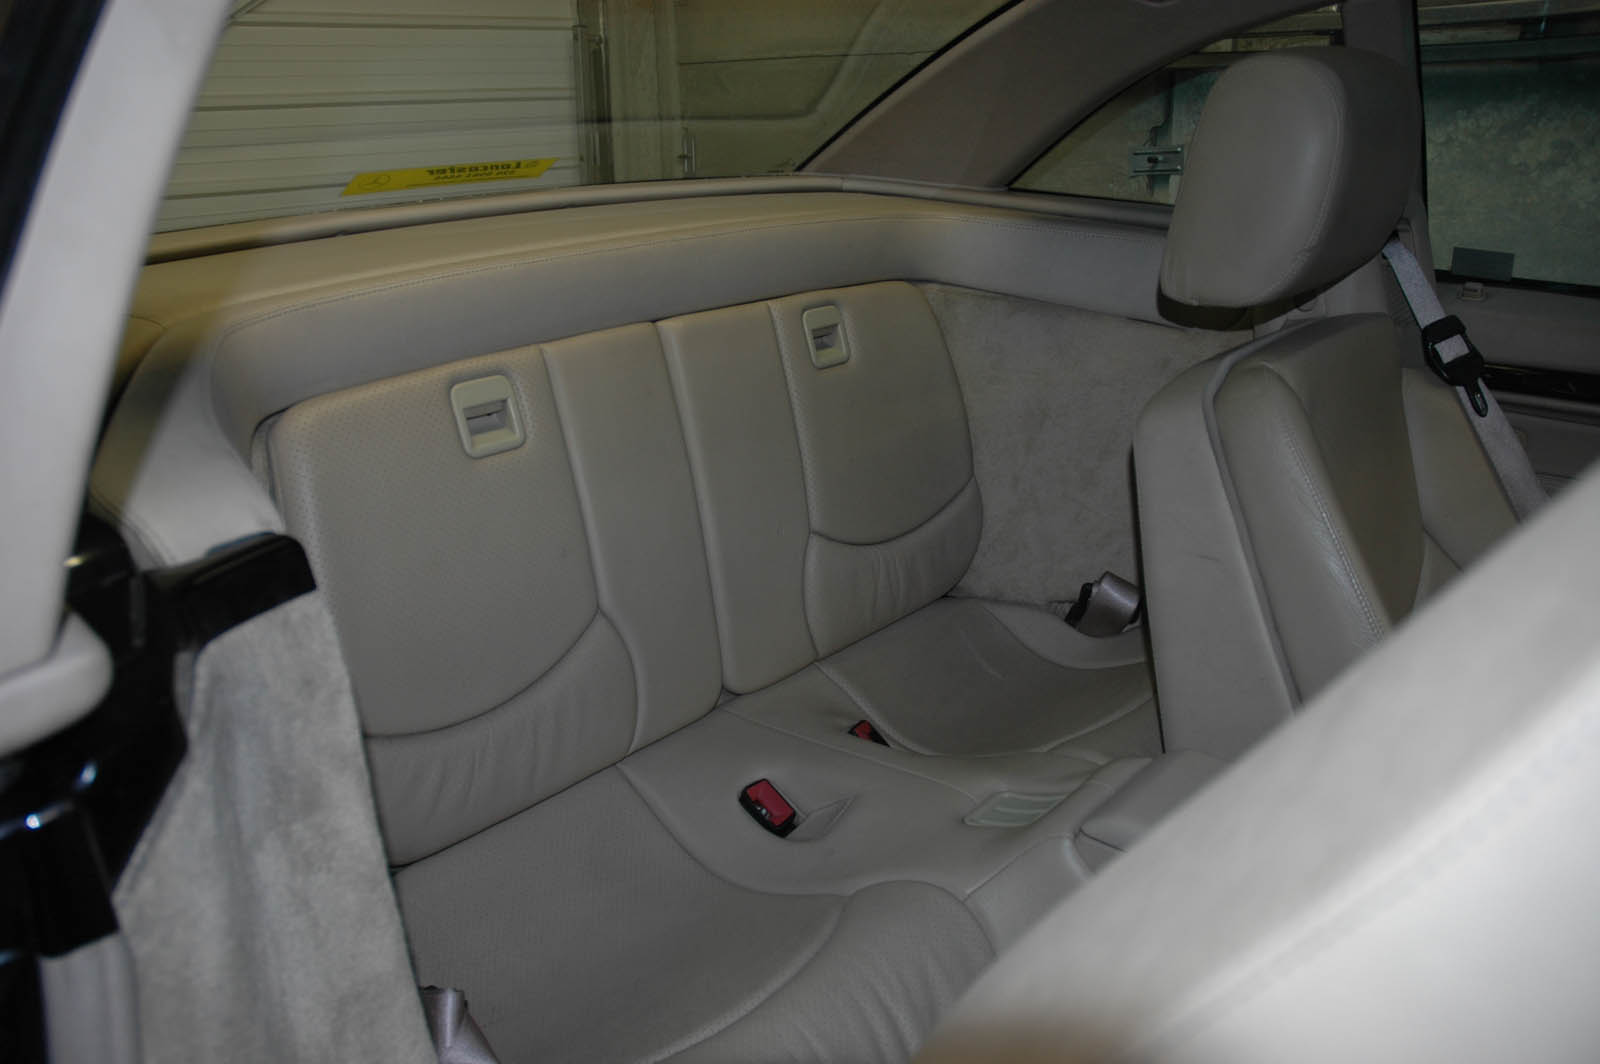 97229d1157049923 R129 Sl Roadster Rear Jump Seats Rear Seats.jpg. Full resolution  snapshot, nominally Width 1600 Height 1064 pixels, snapshot with #59503B.